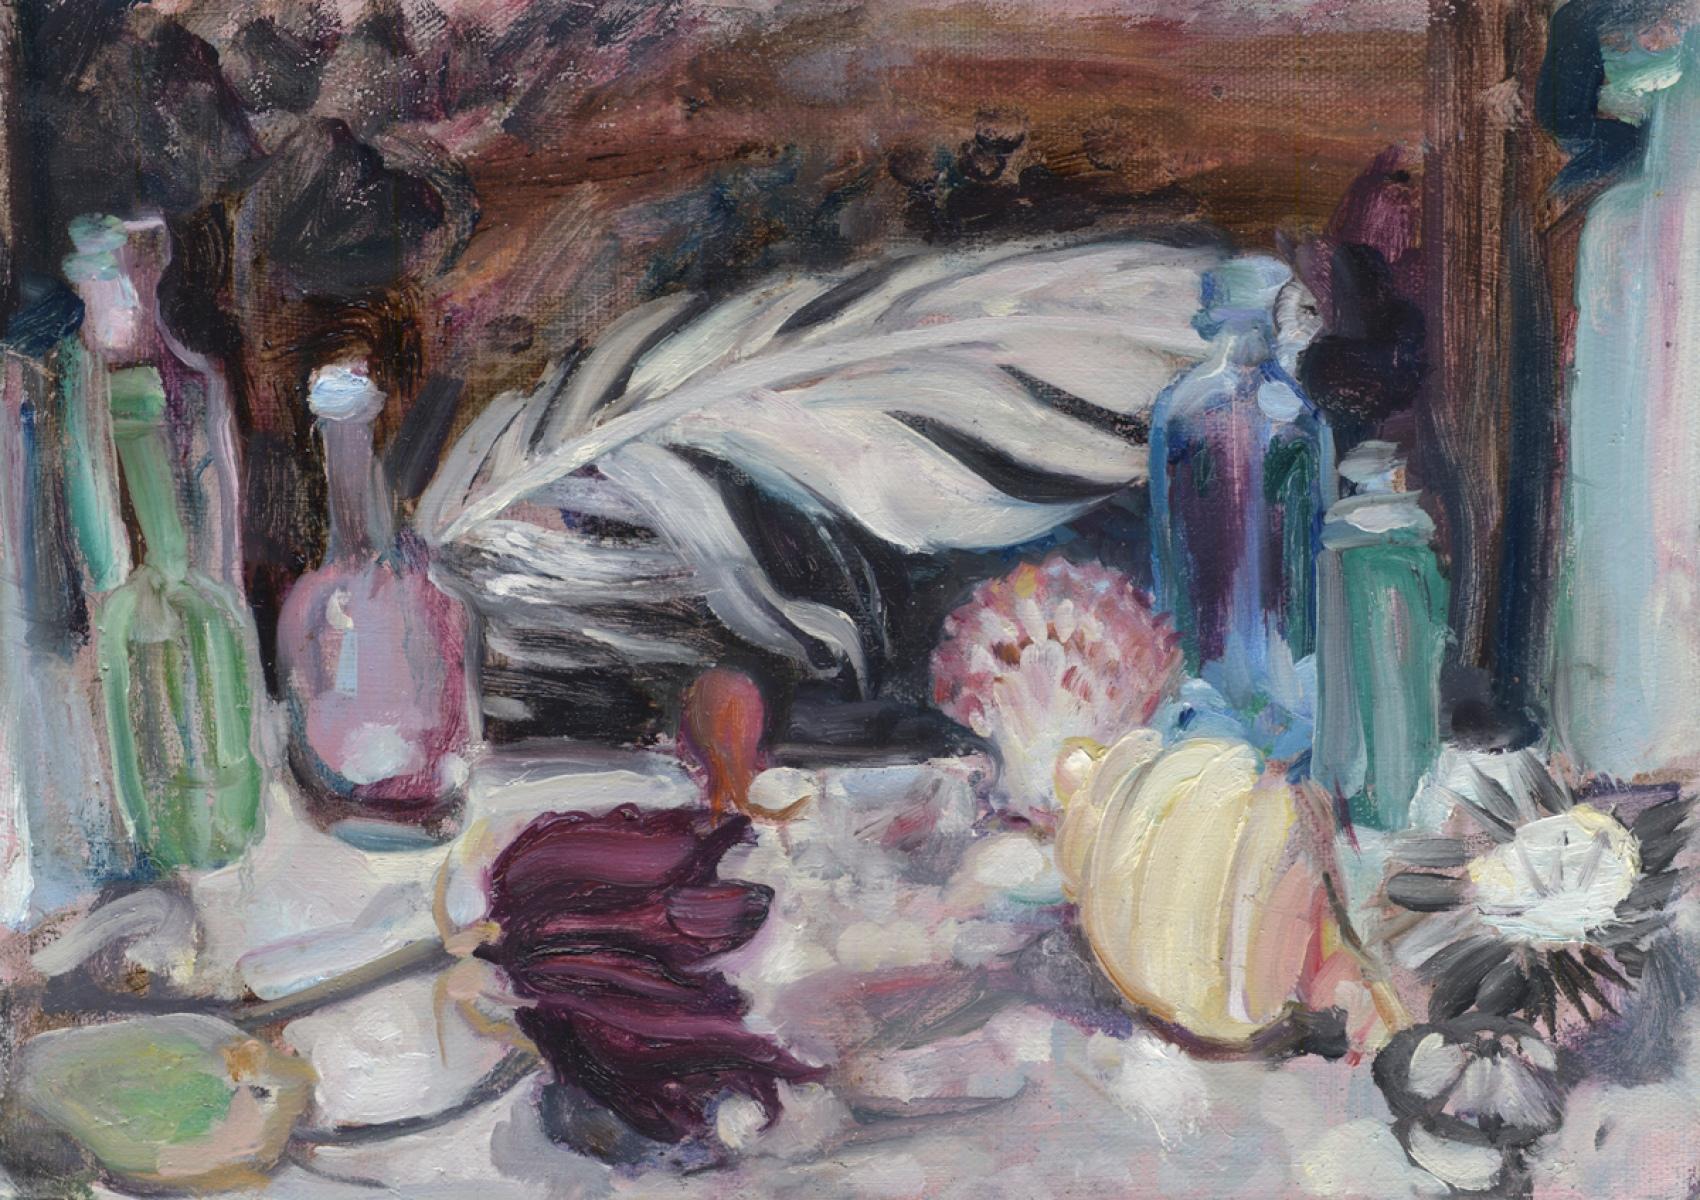 Katherine Tulloh, K798, Untitled, 2018, oil on canvas, 255 x 355mm